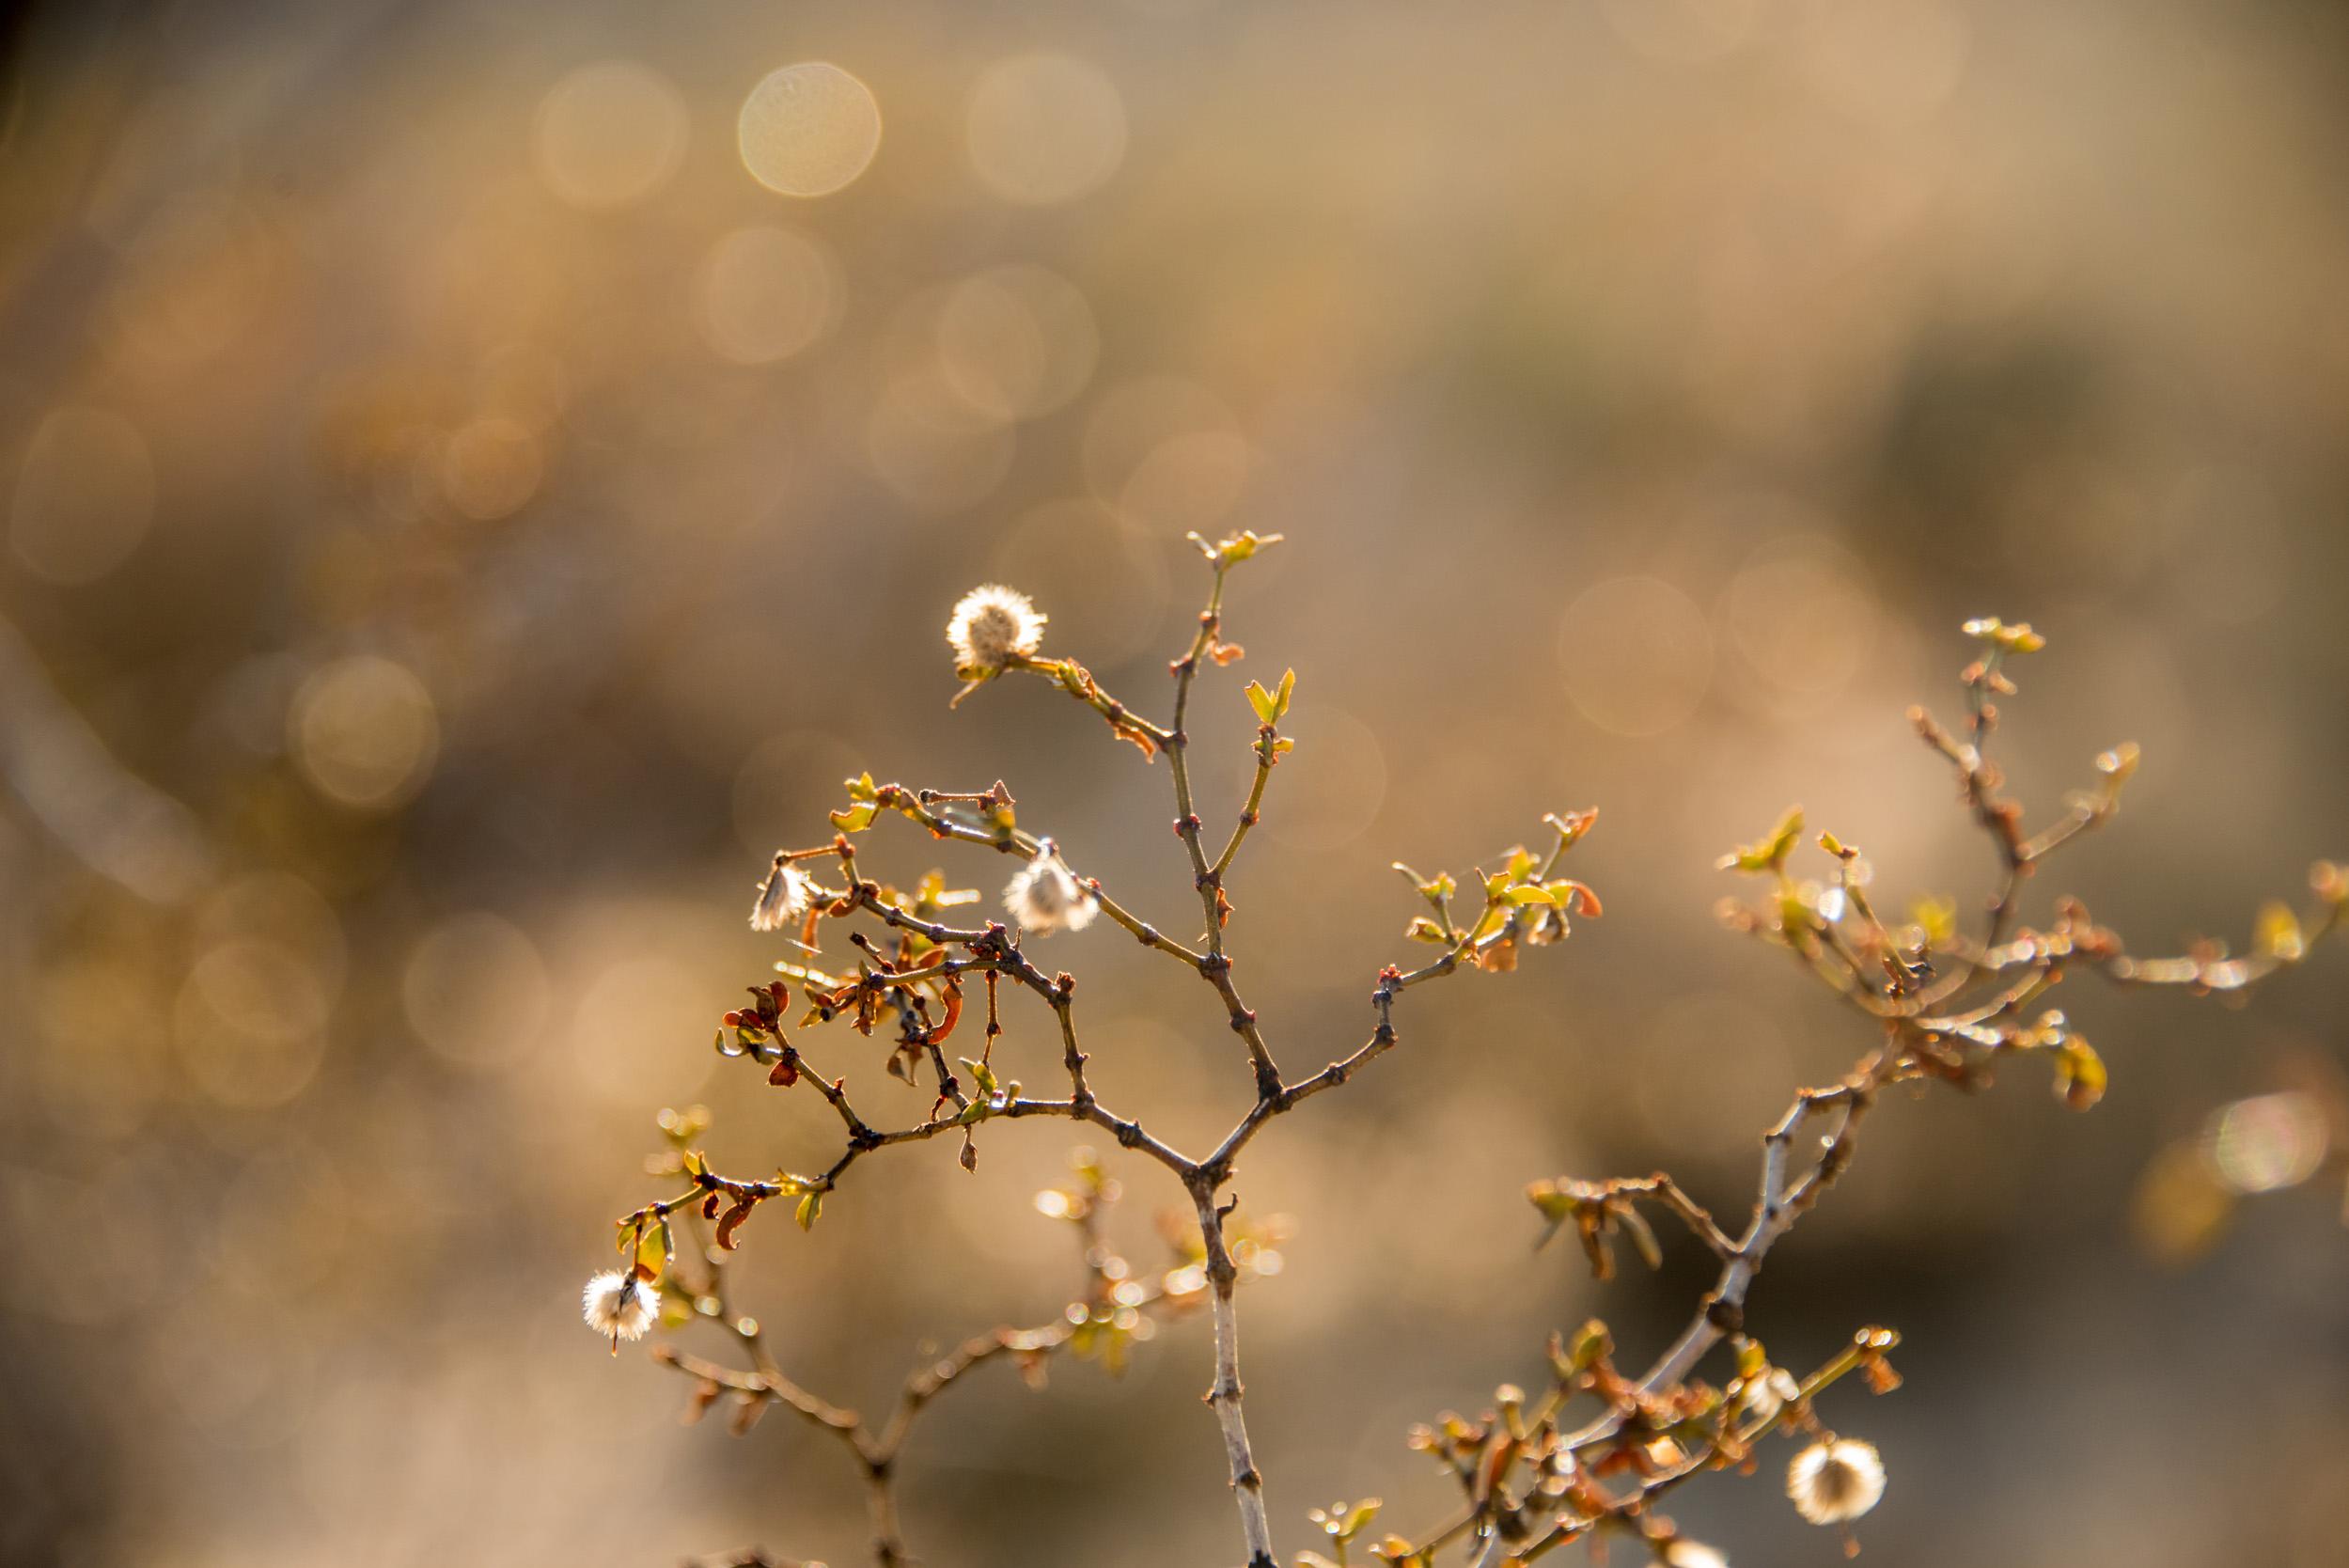 Britt_Nemeth_Studios_PhotographyNature_Spaces_Places_Vaction_Travel027.jpg